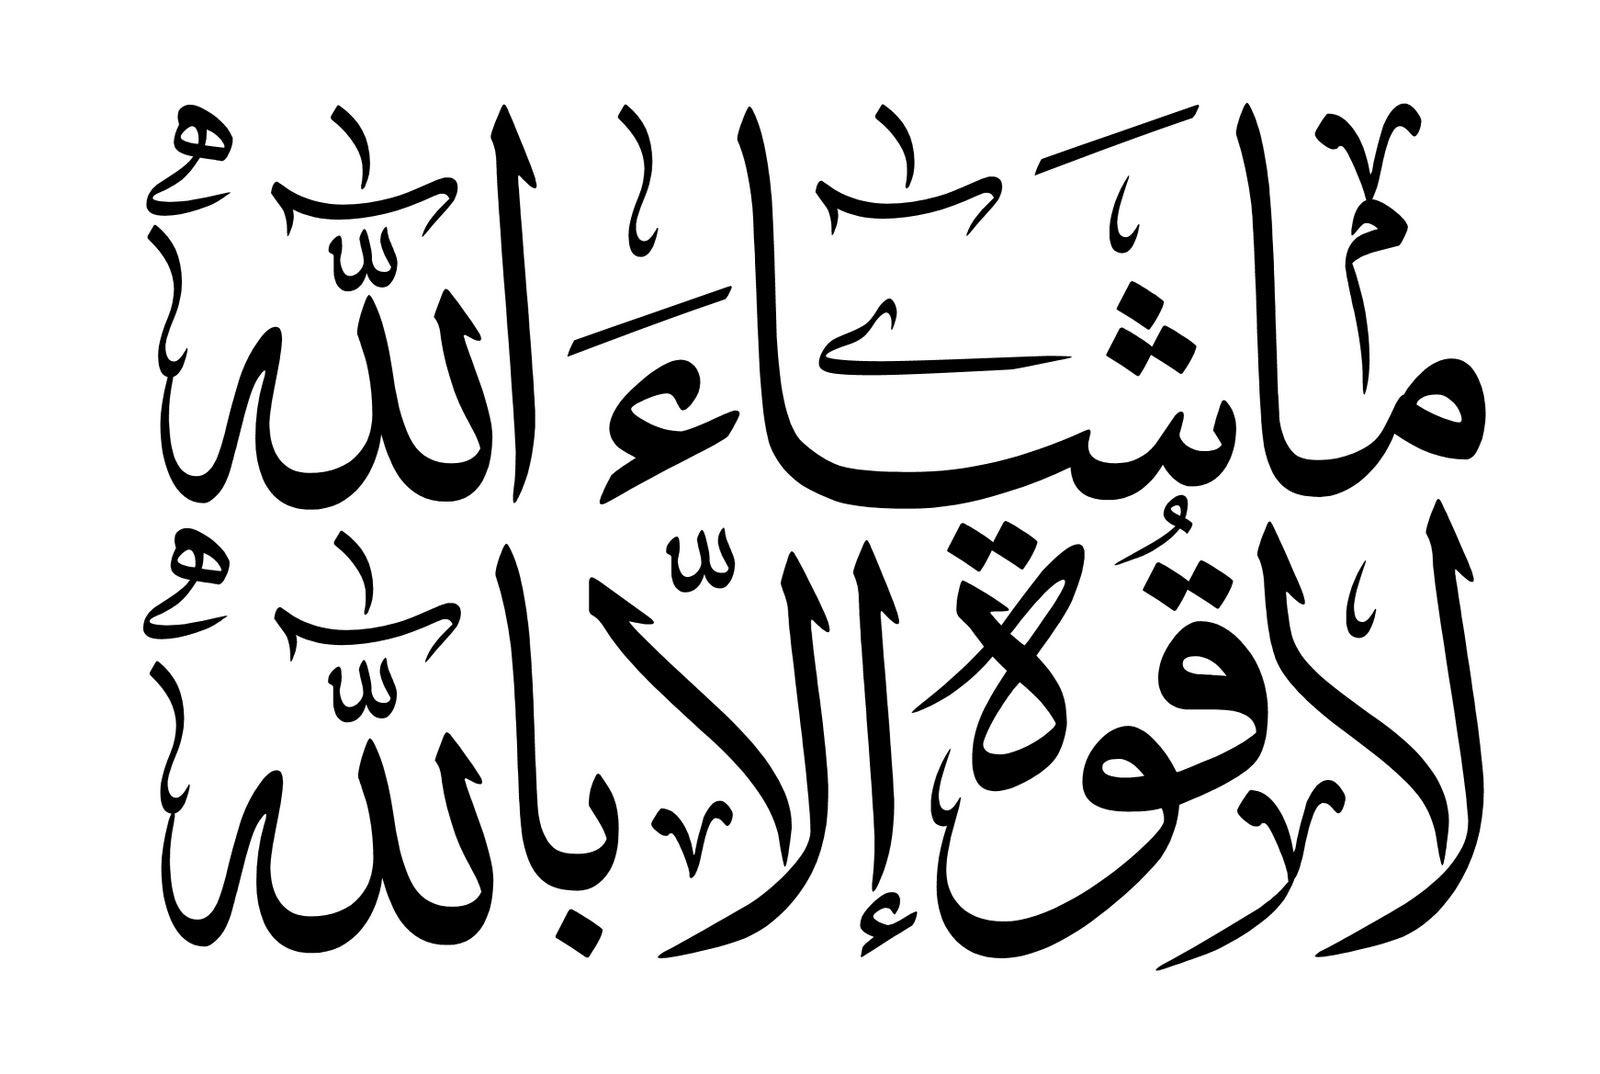 Maa+Shaa5+Allah+Laa+9ouwwata+5lla+billah+Rect1.jpg (image